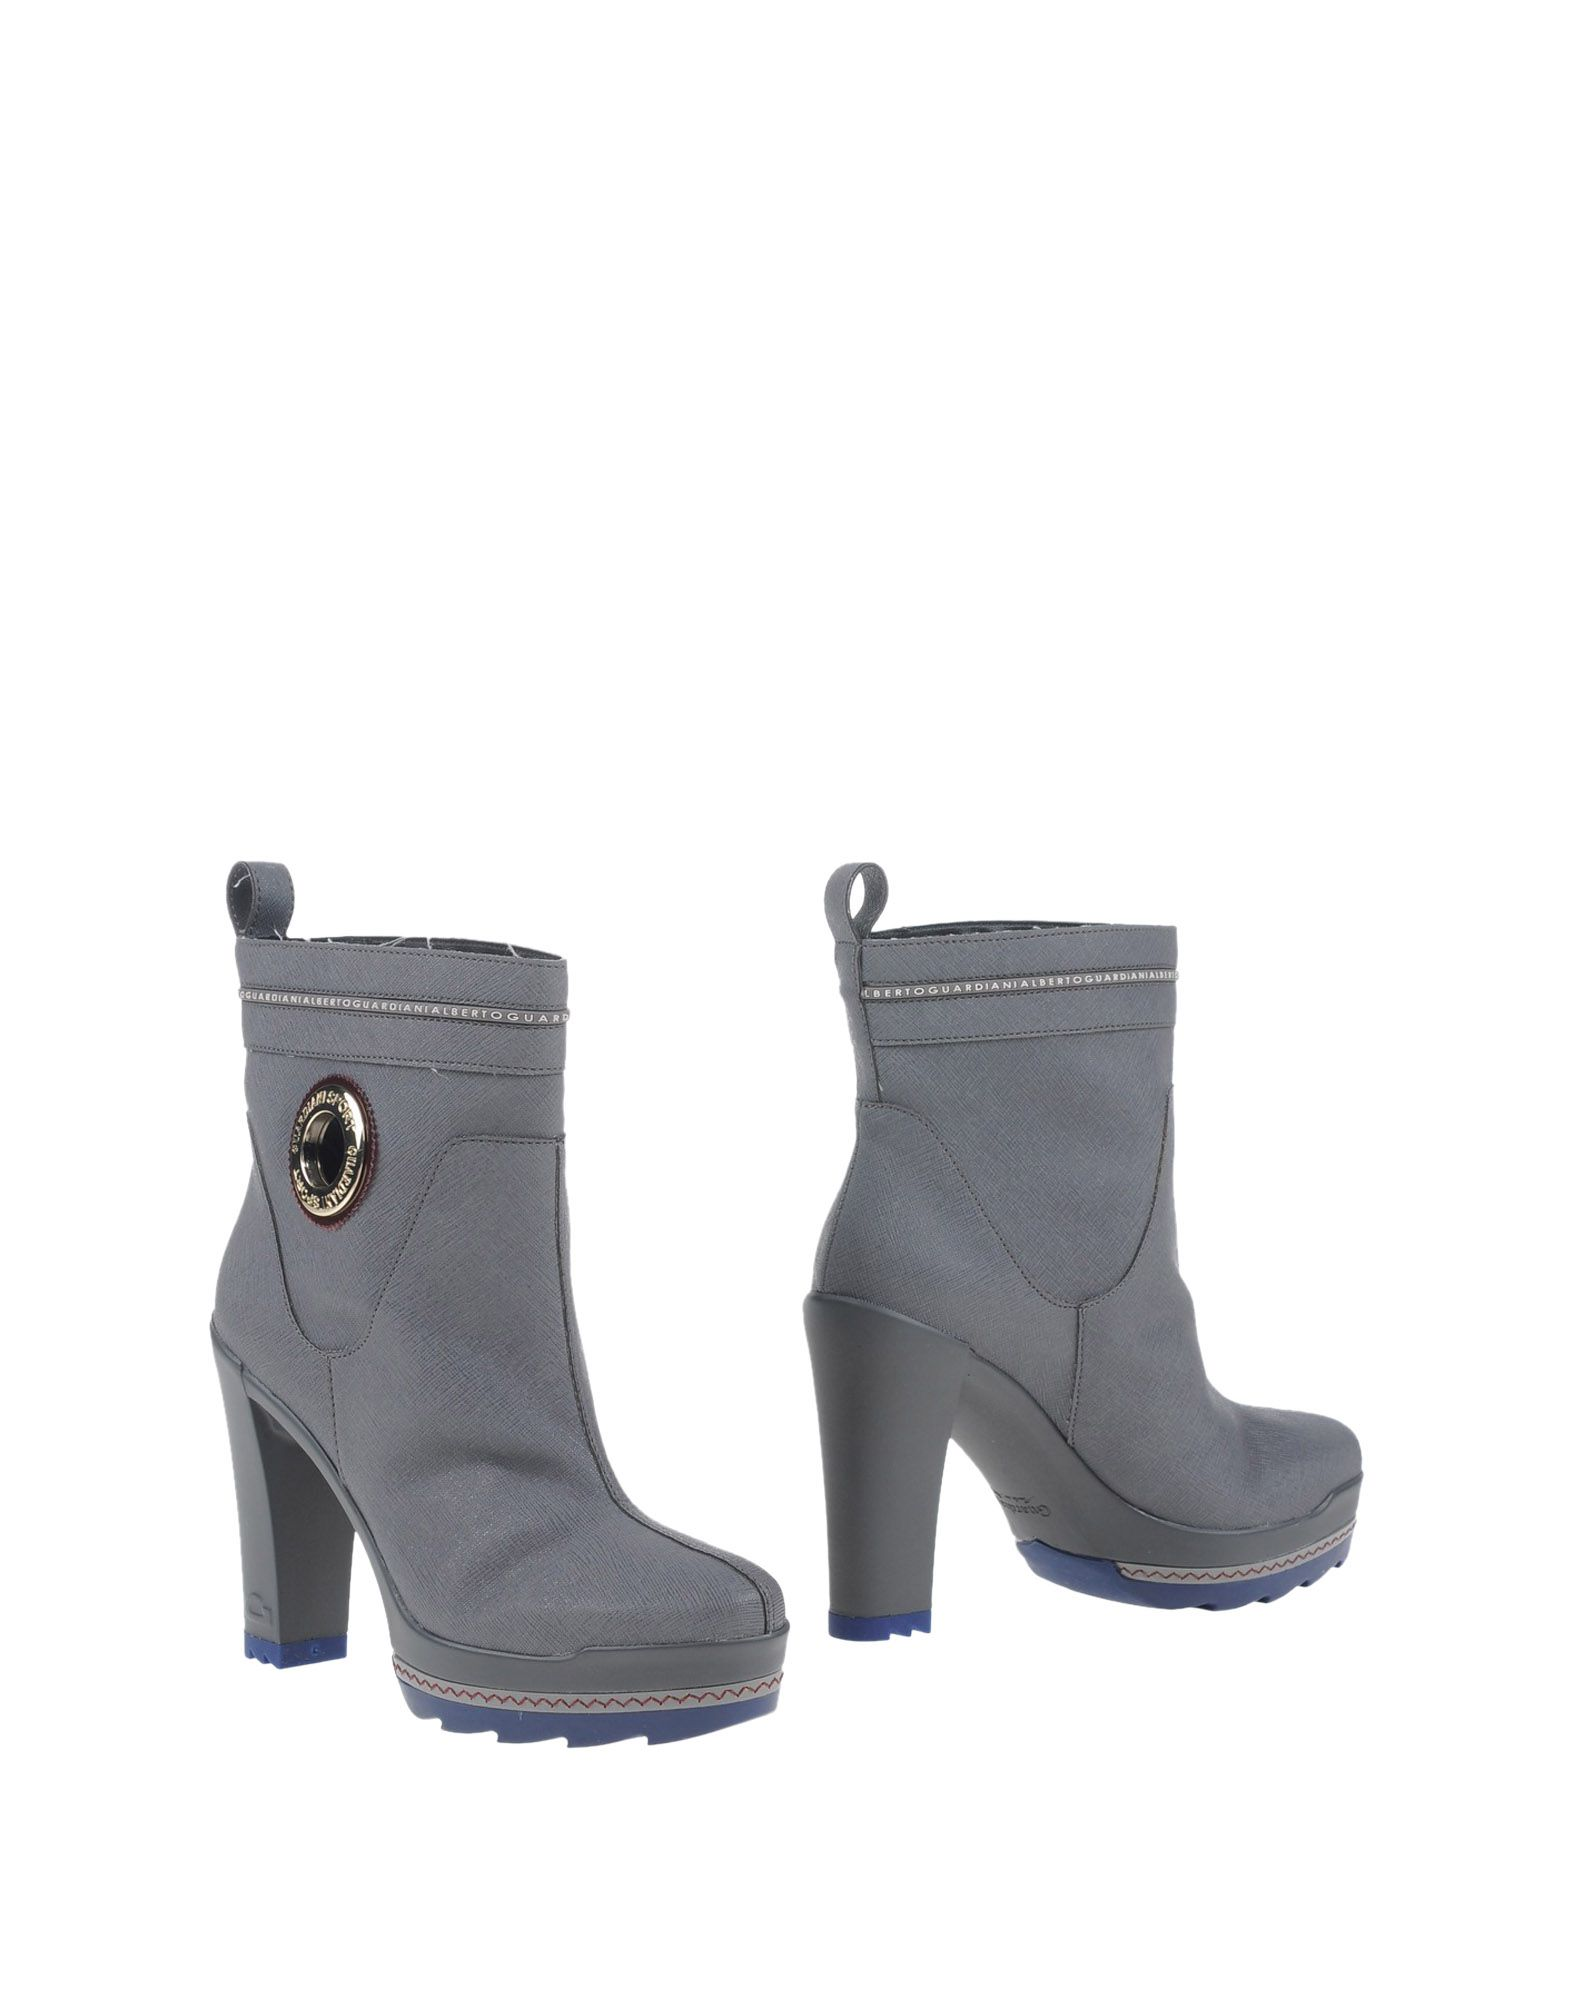 Alberto Guardiani Stiefelette Damen  11048851DI 11048851DI  Neue Schuhe 54c2ef